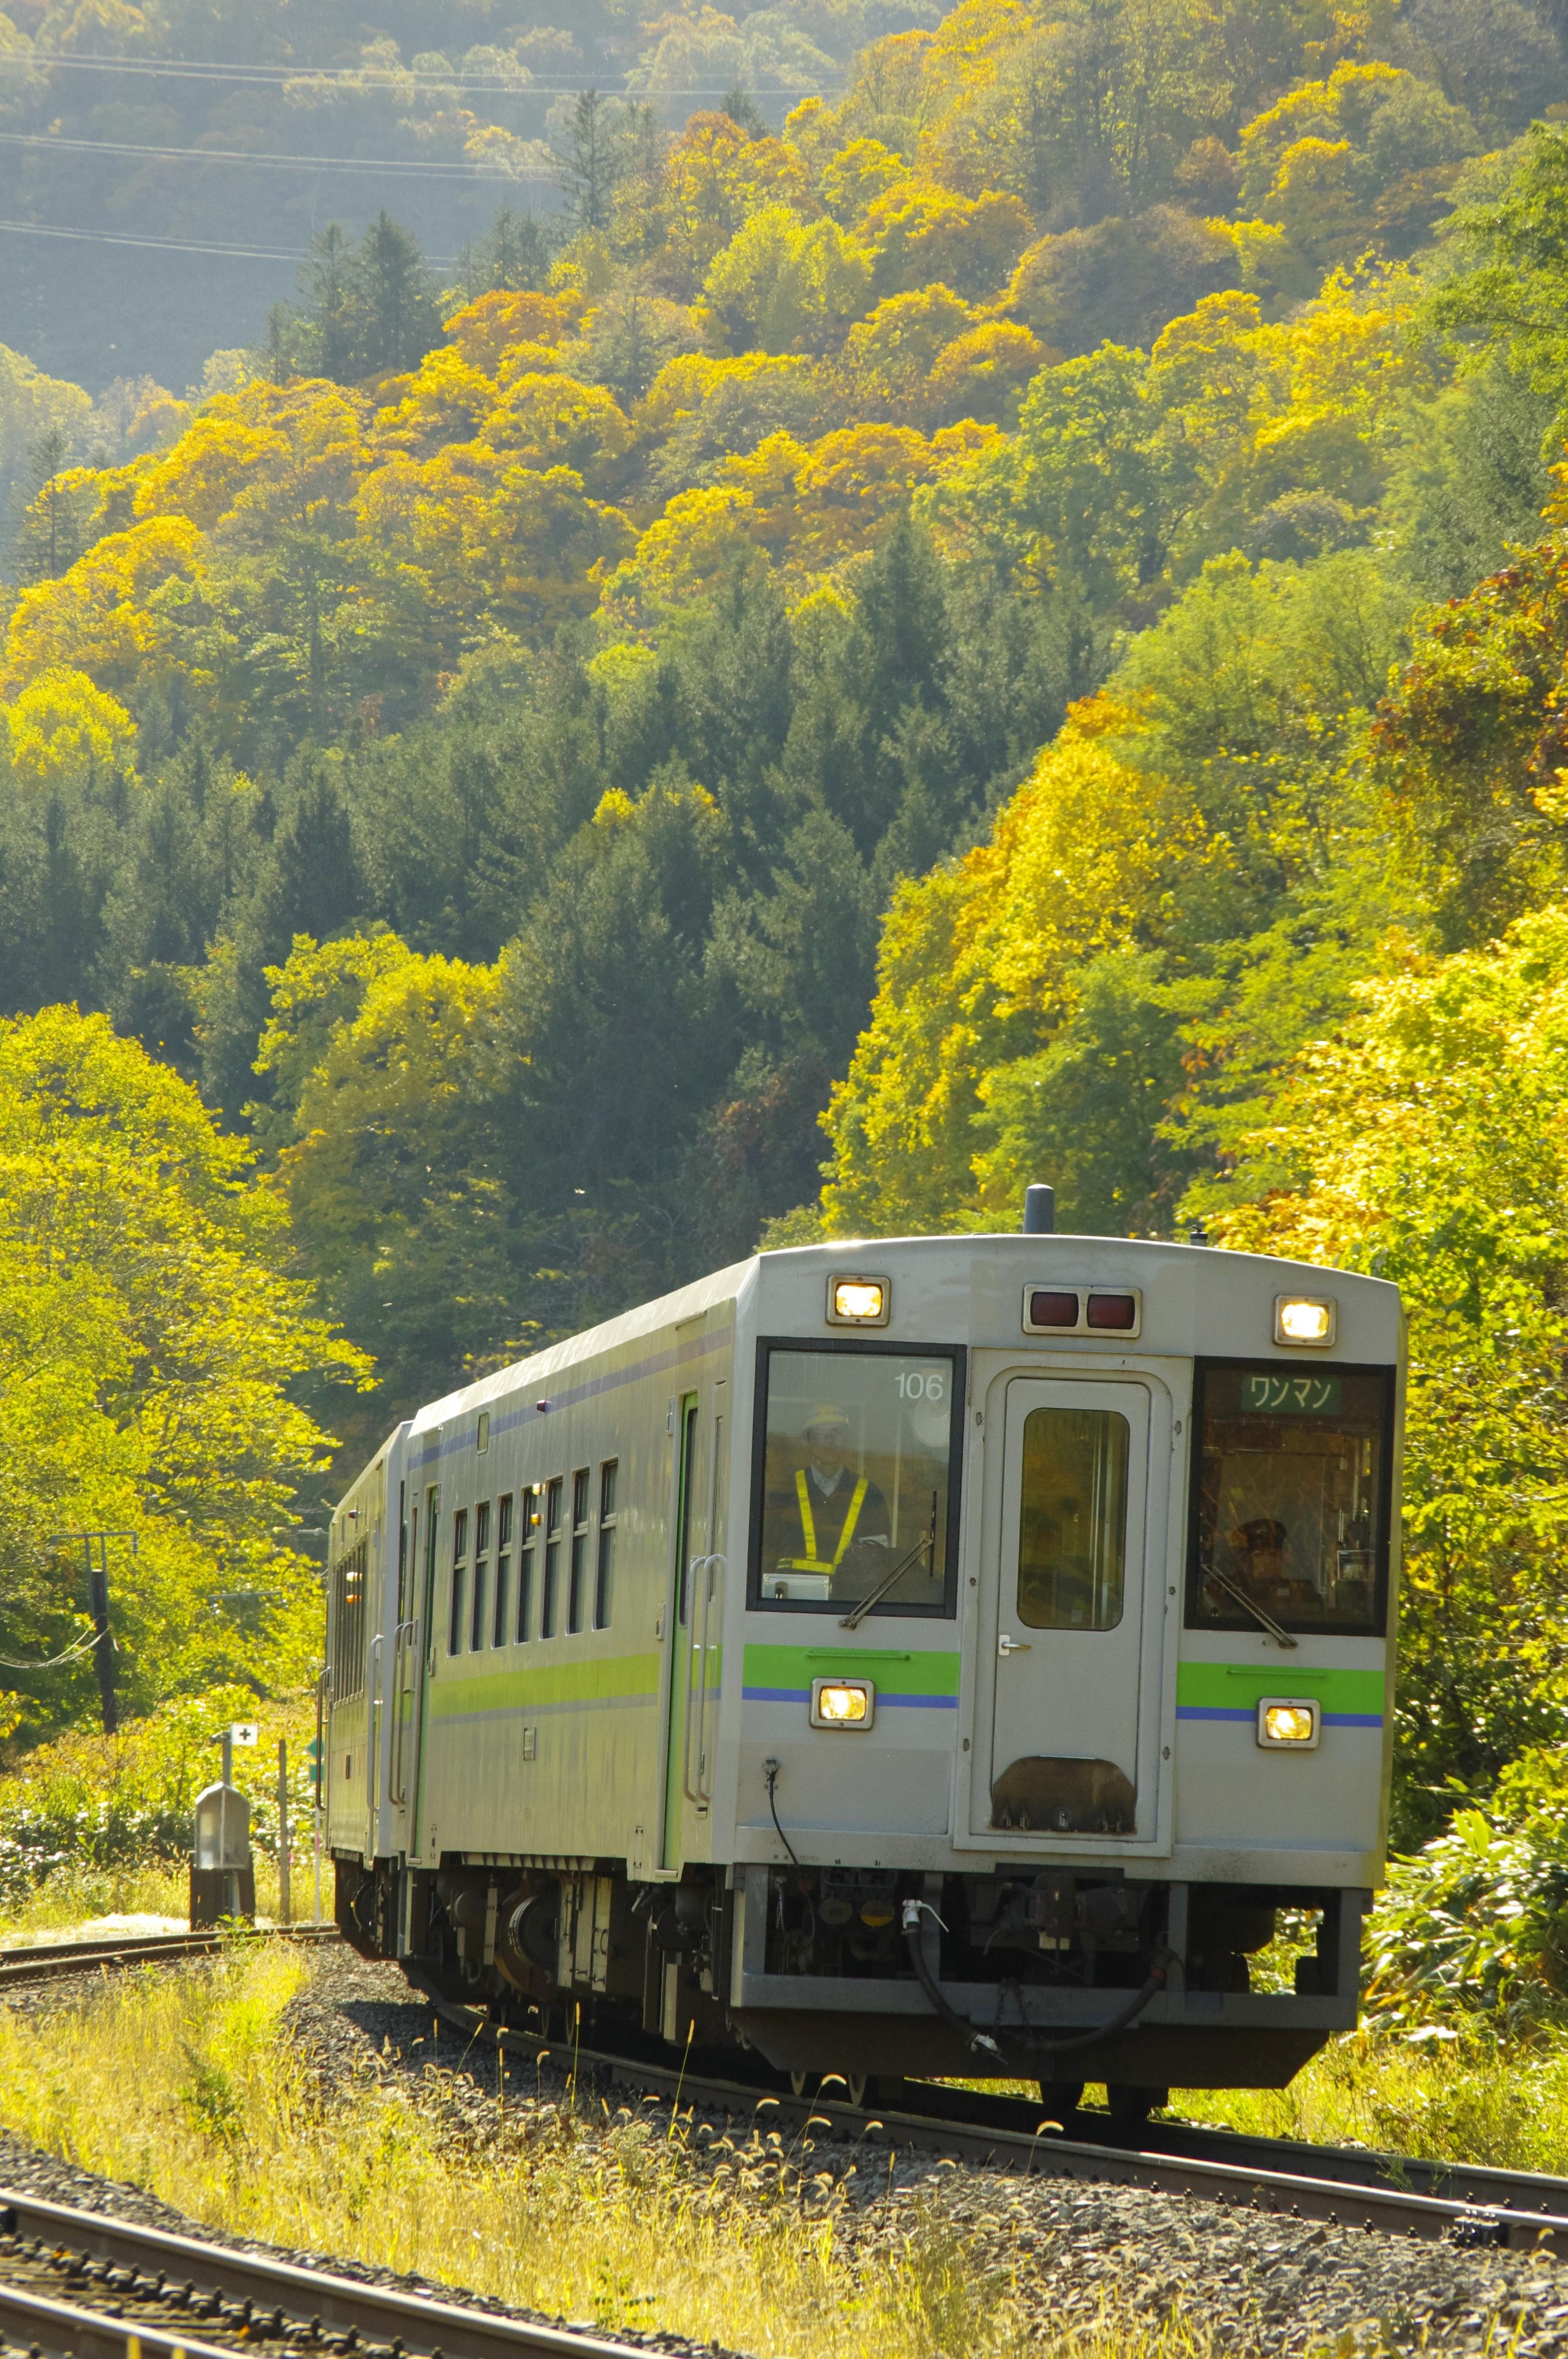 キハ150×2 1933D 銀山駅入線 191020.jpg